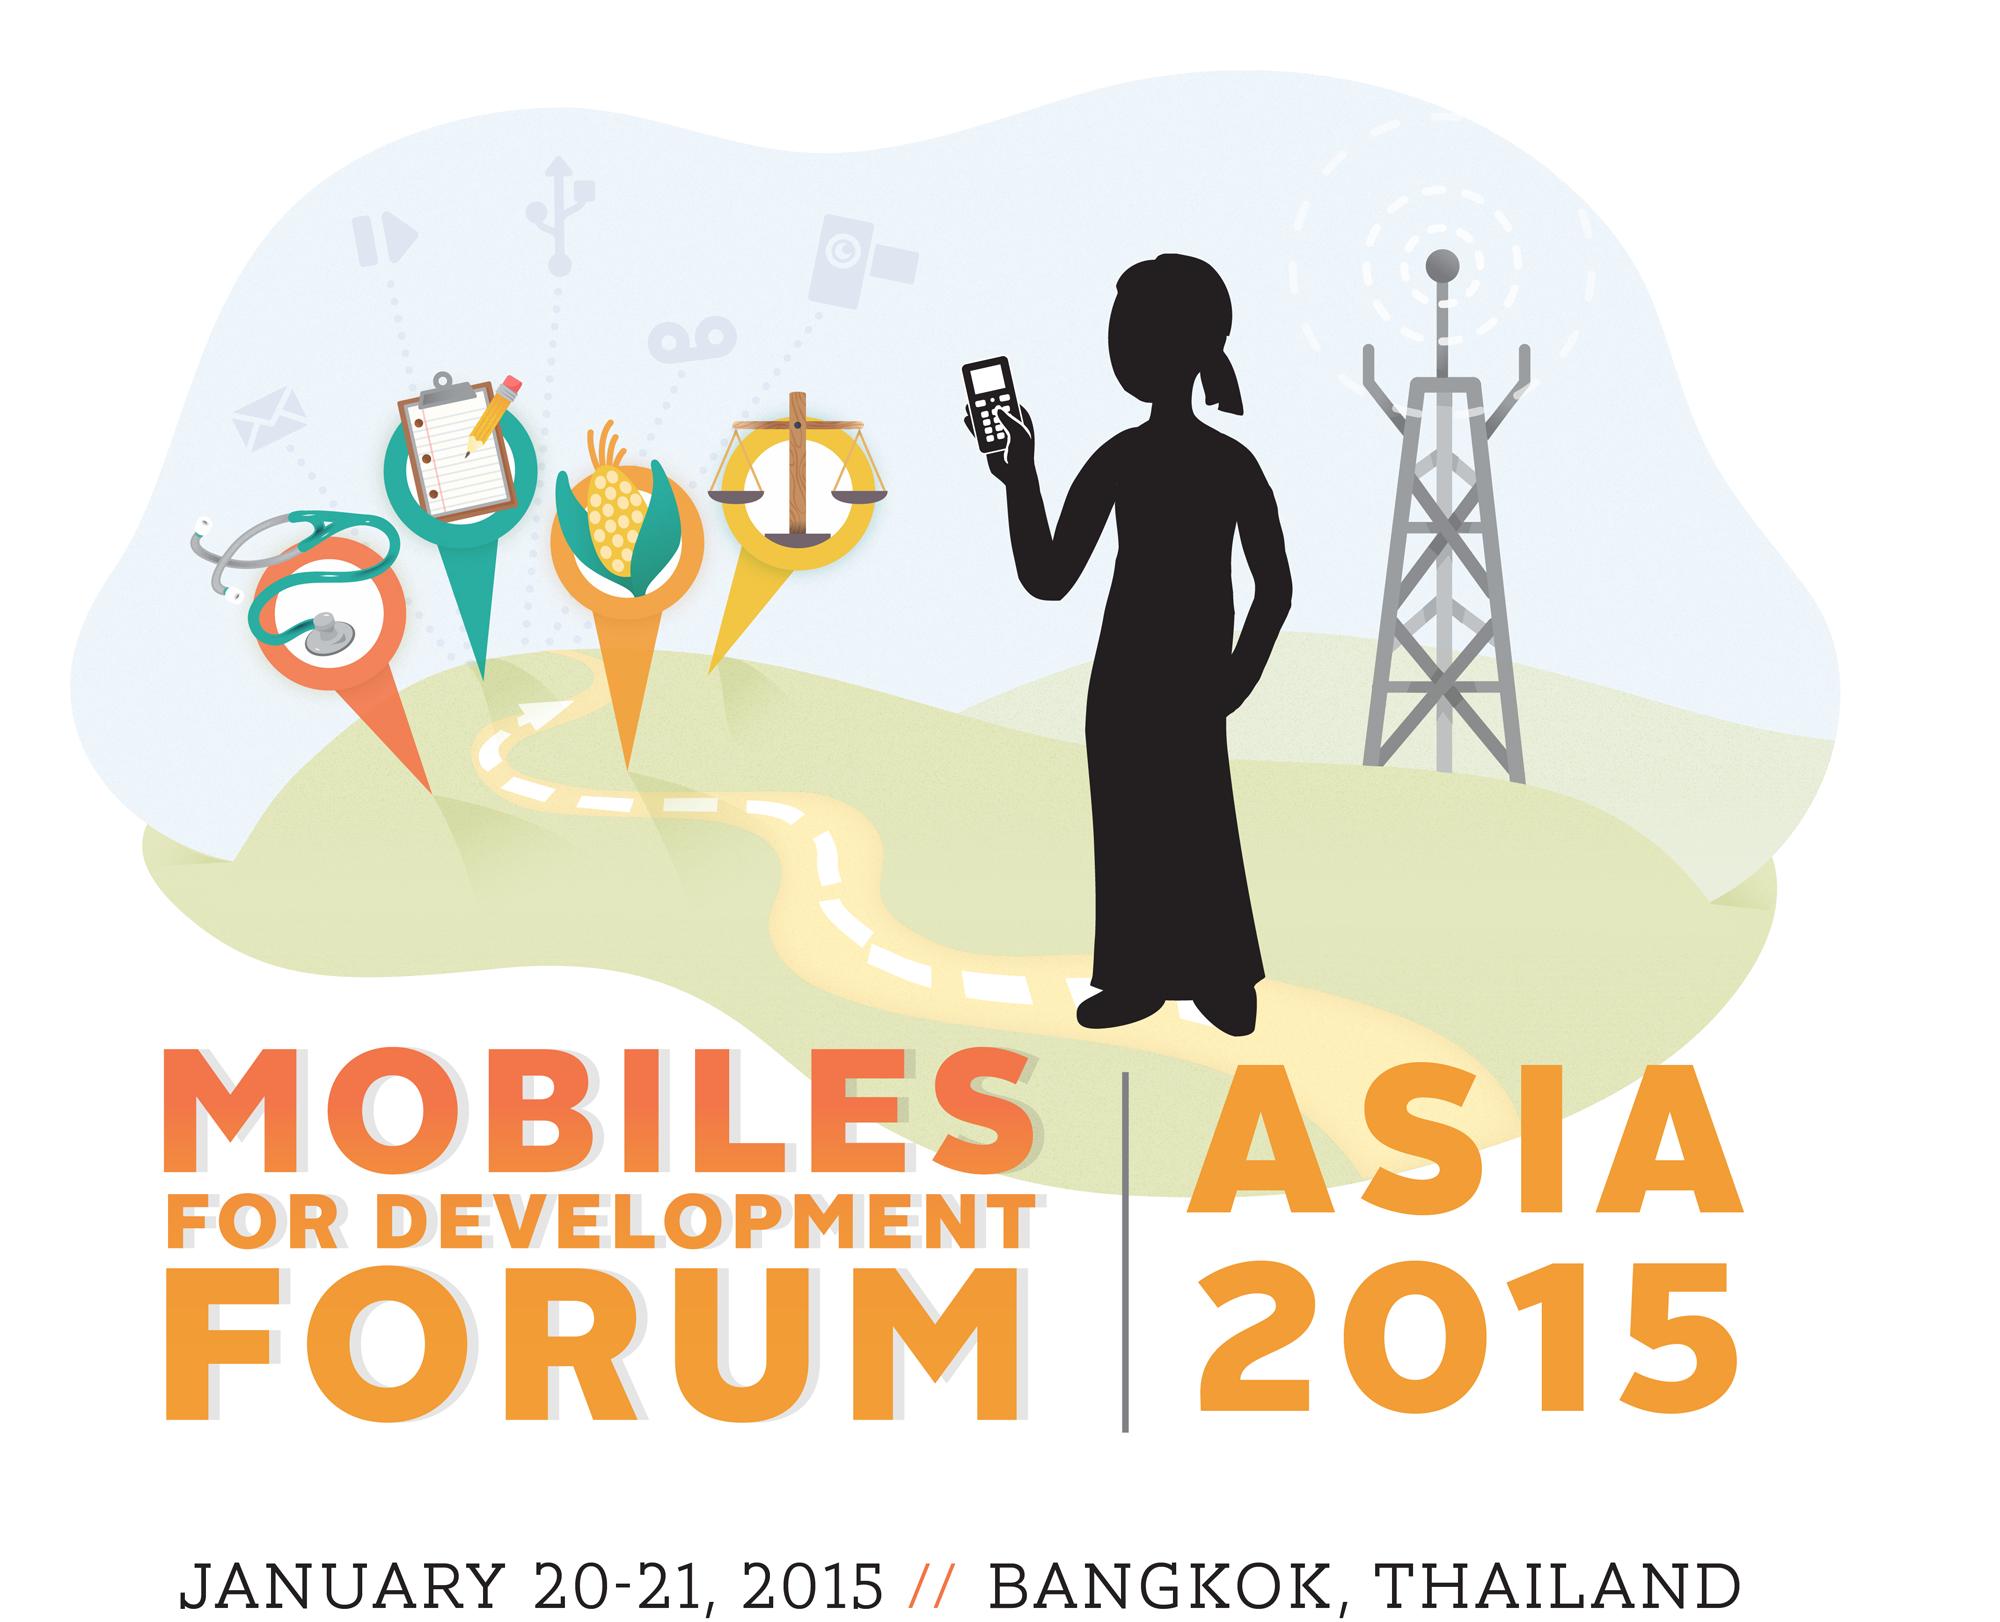 Tentative Agenda - Mobile for Development Forum Asia 2015